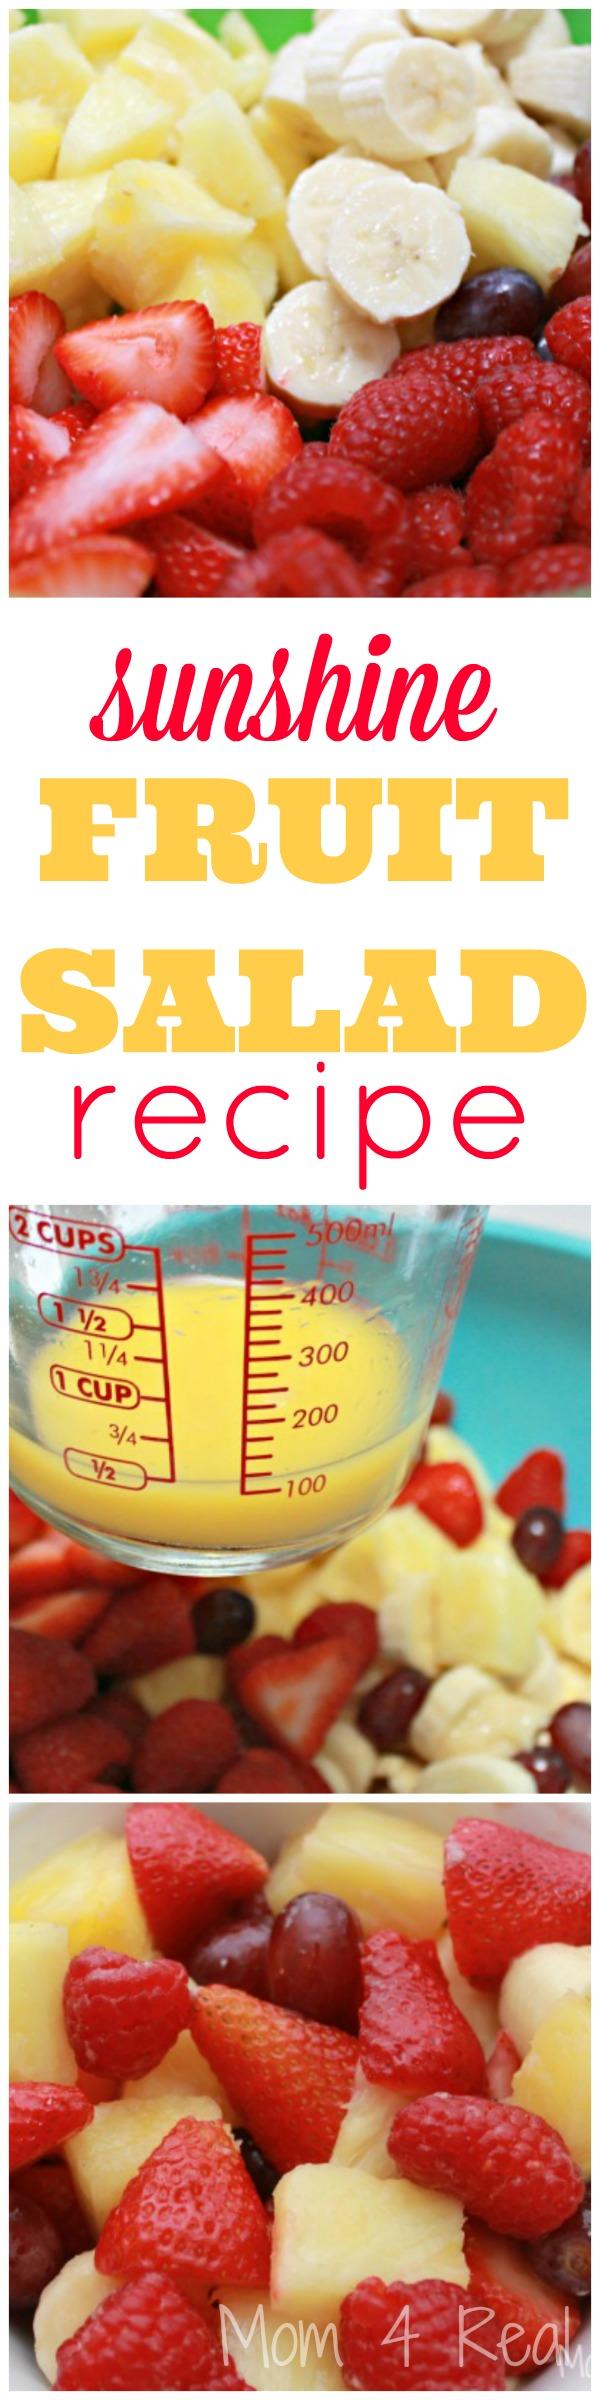 Sunshine Fruit Salad Recipe @ Mom 4 Real